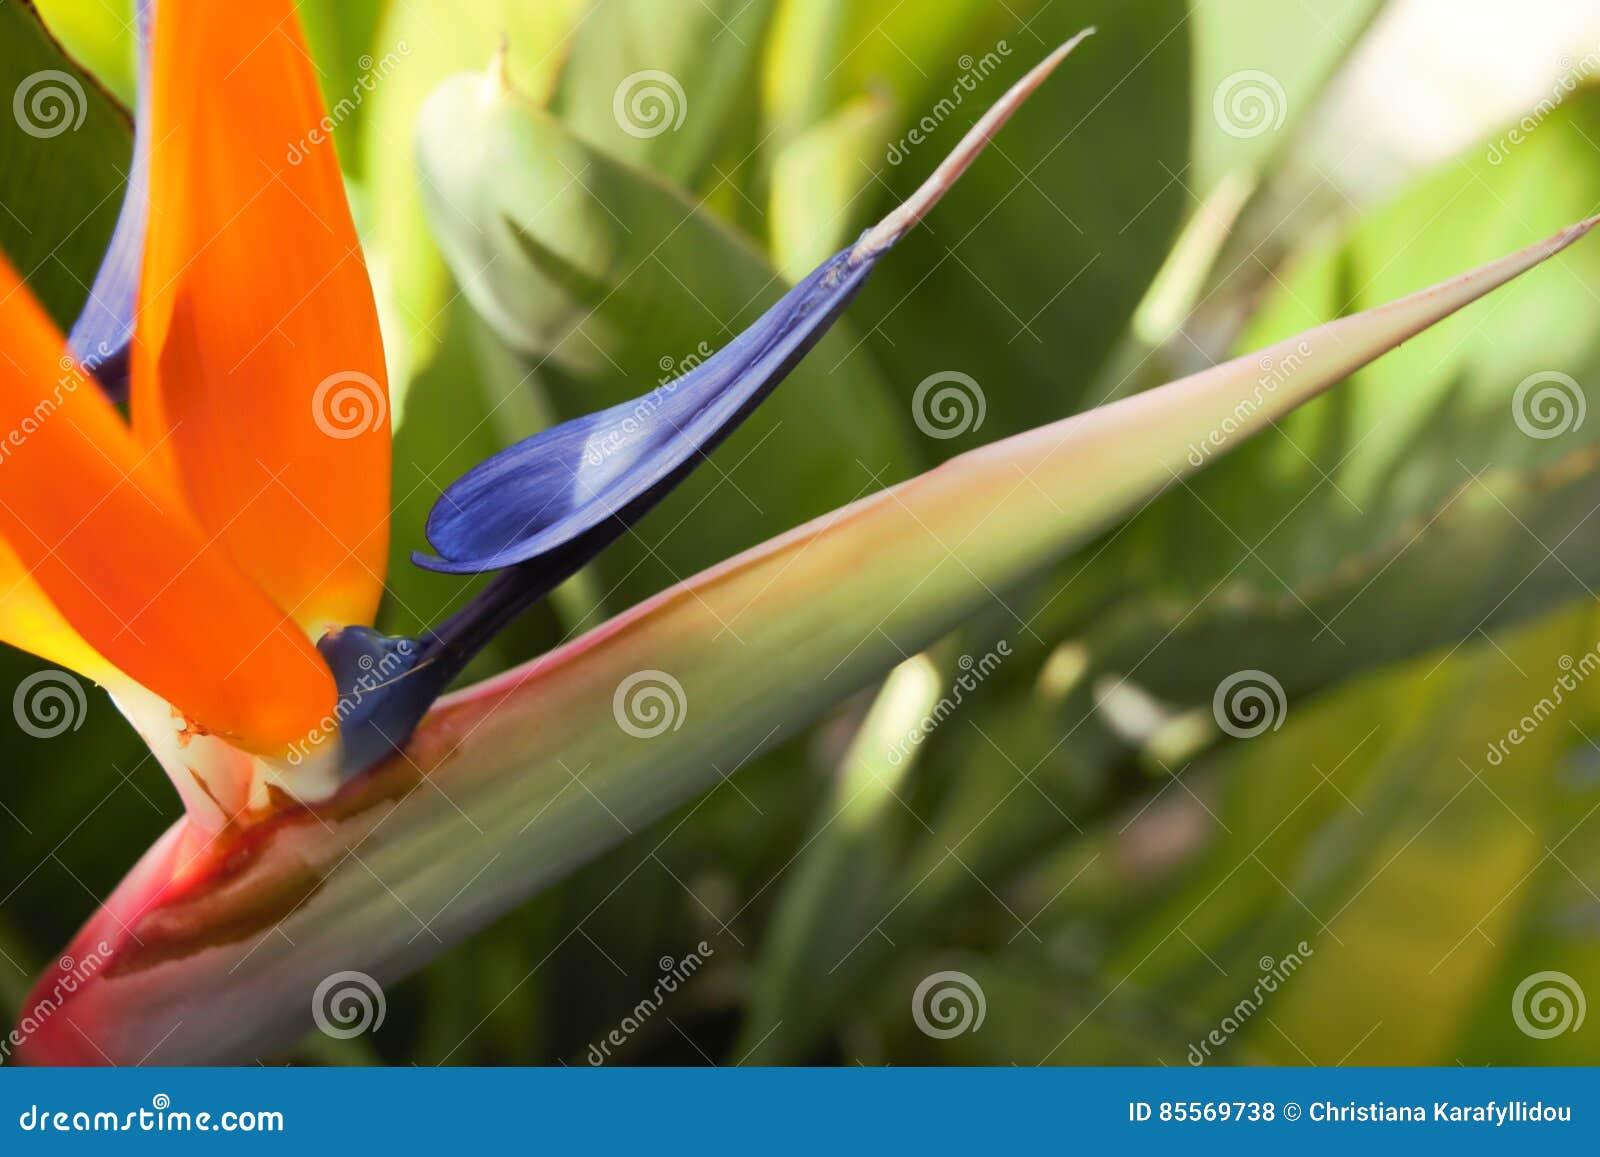 Strelitzia bird of paradise flower stock photo image of nature royalty free stock photo izmirmasajfo Images